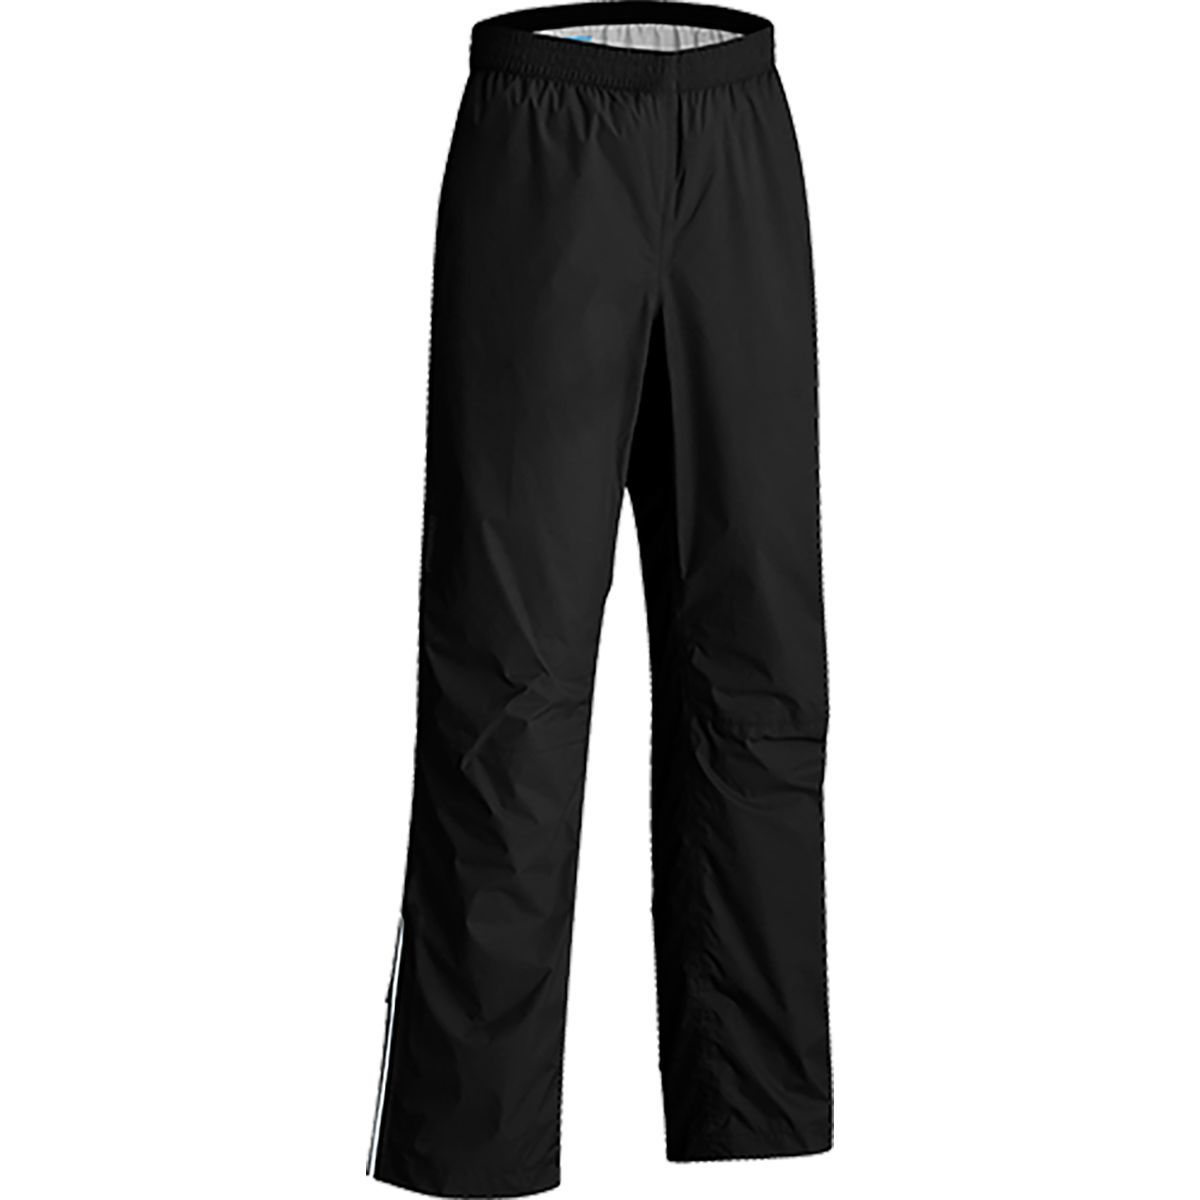 Shimano Explorer Rain Pant - Men's